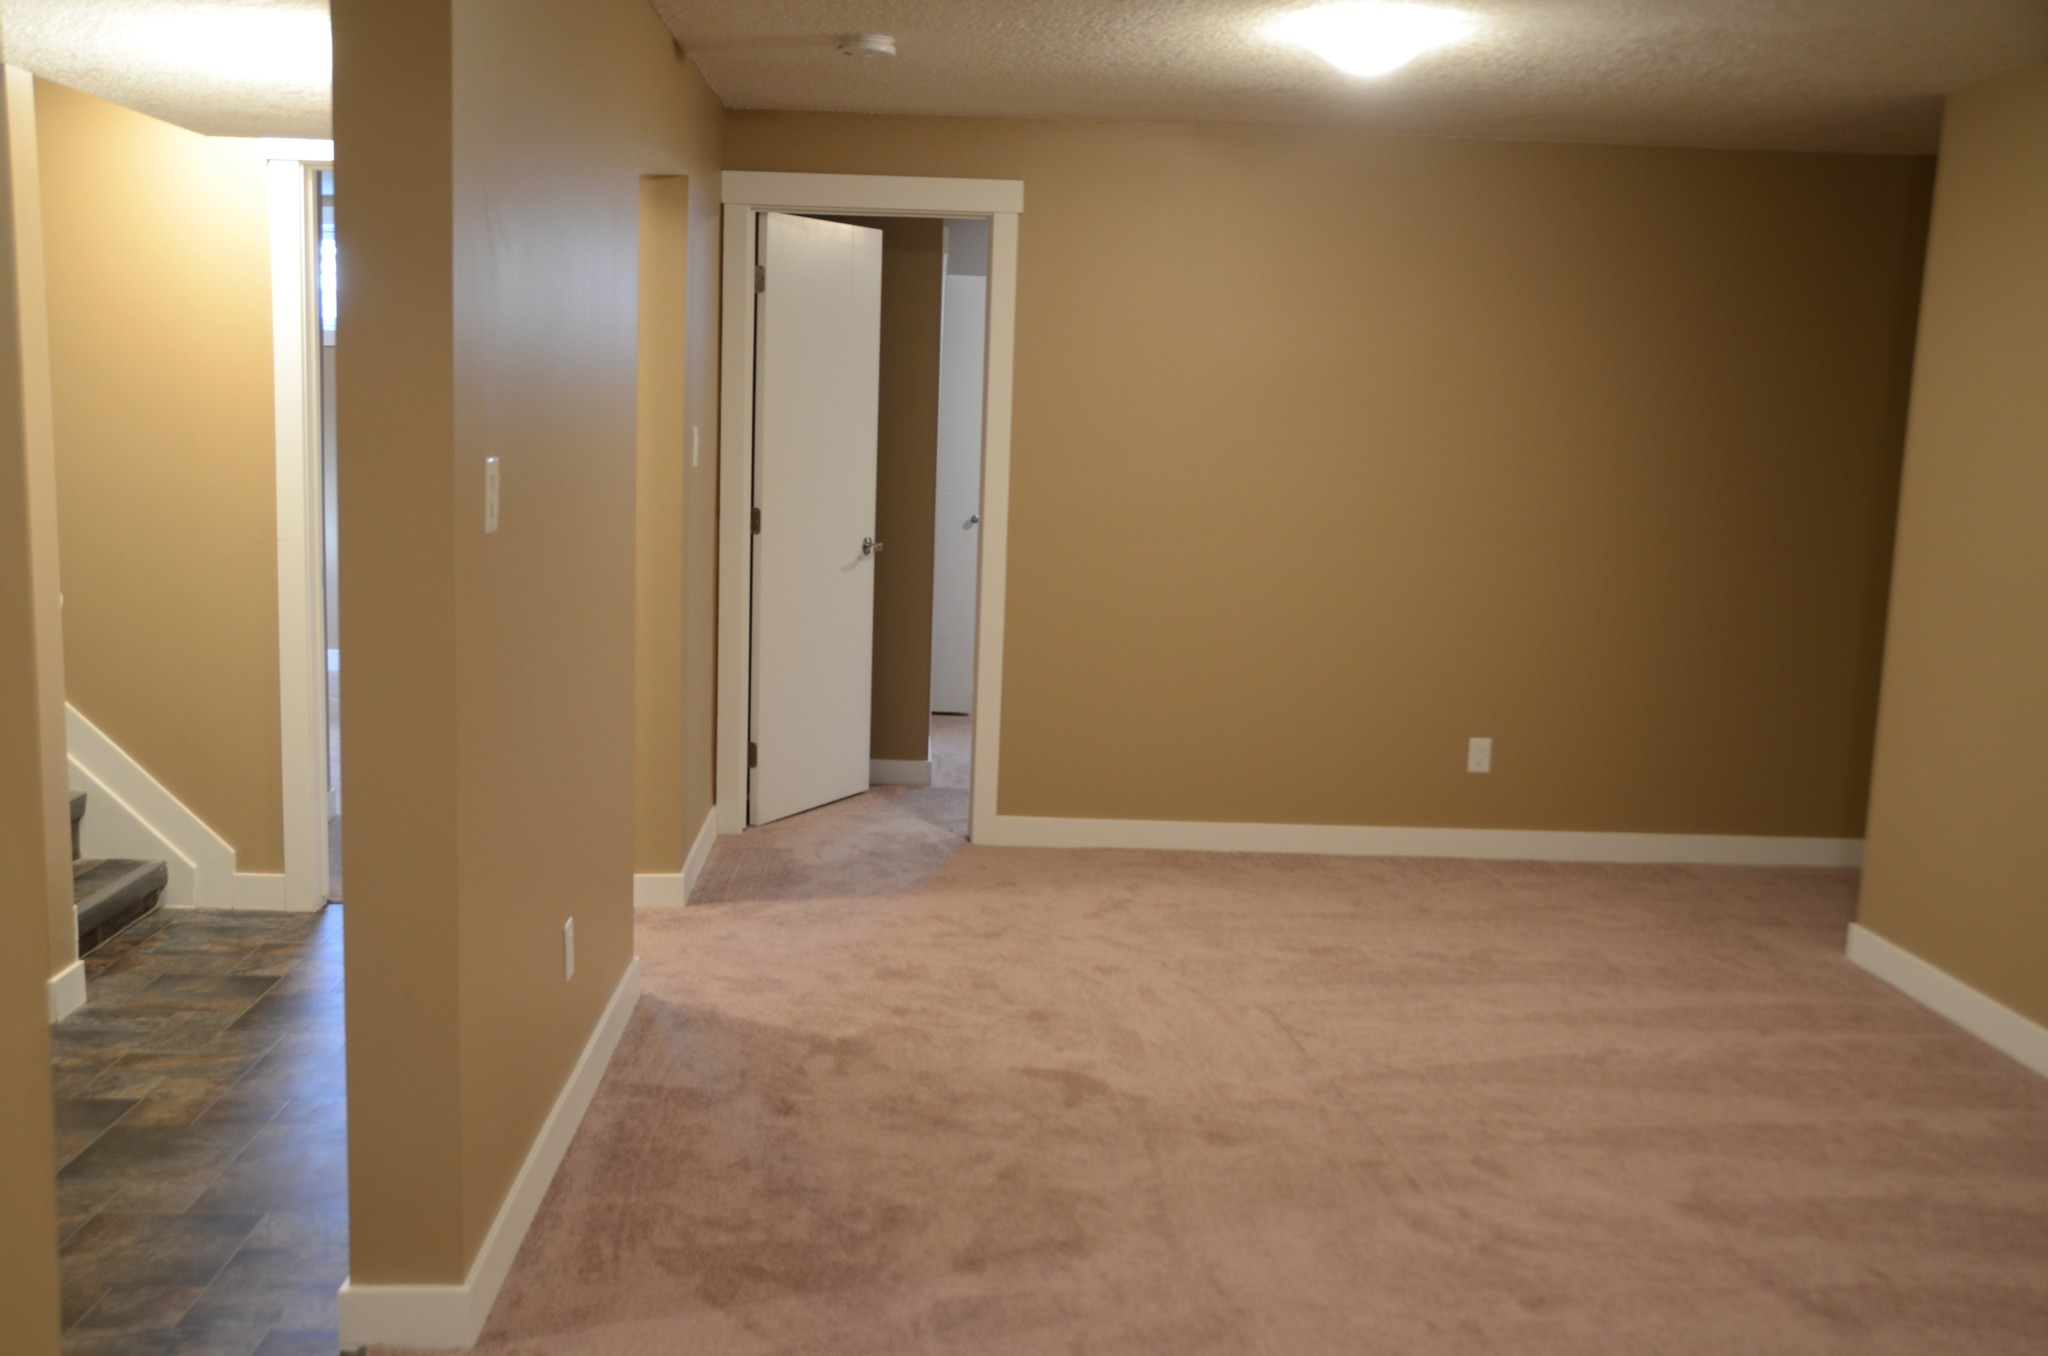 09-13307 Living Room